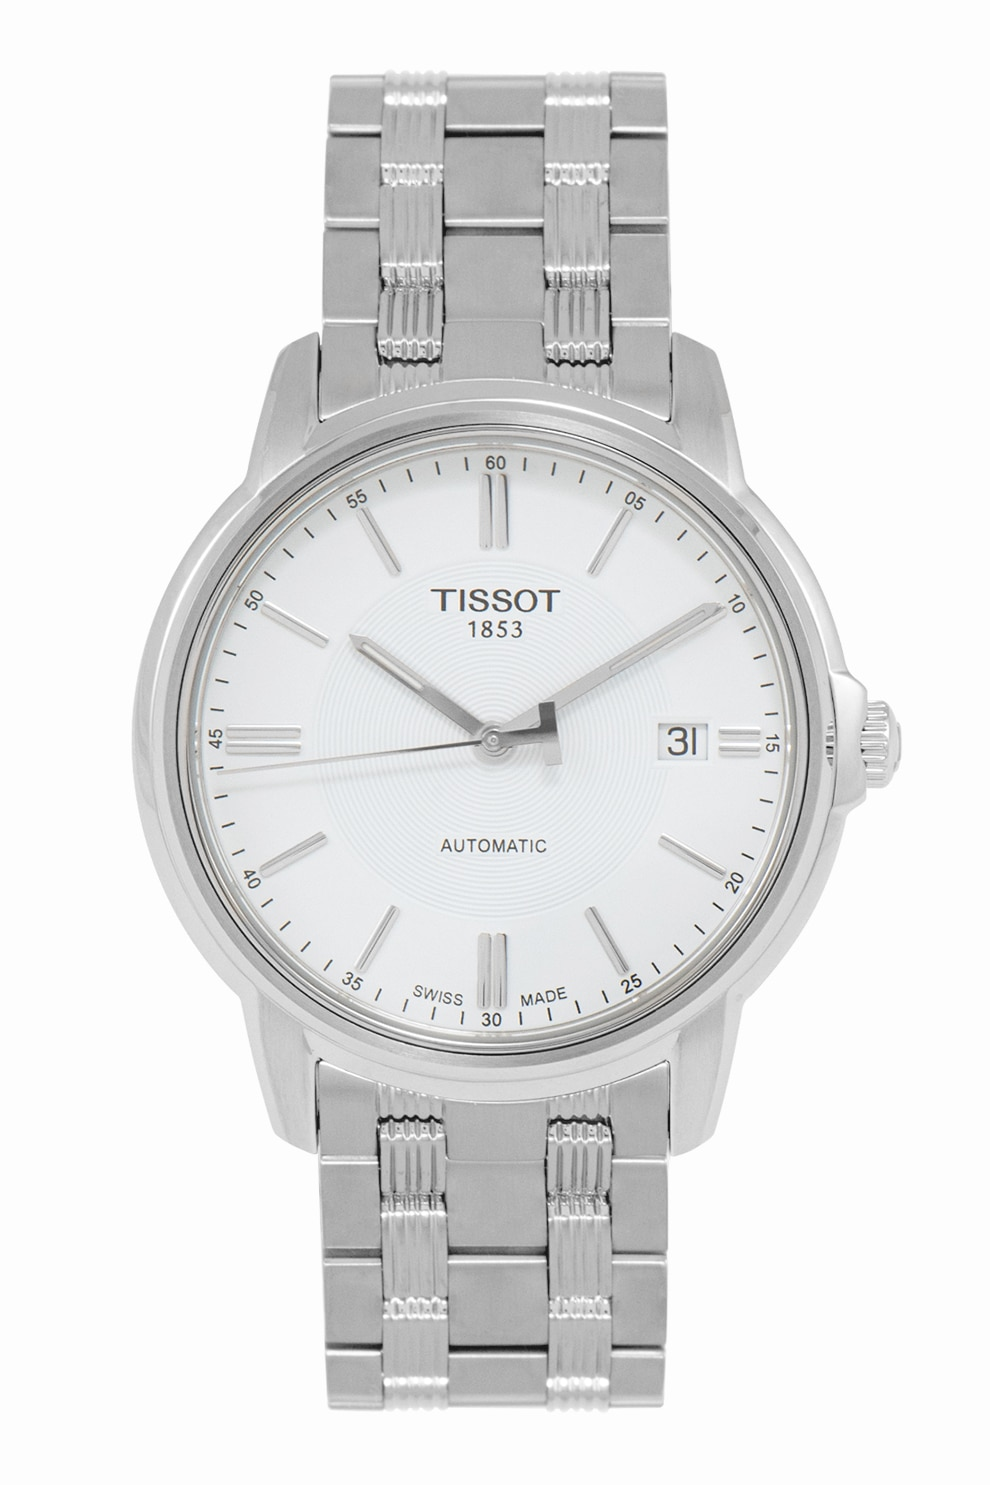 Fotografie Tissot, Ceas automatic din otel inoxidabil, Argintiu